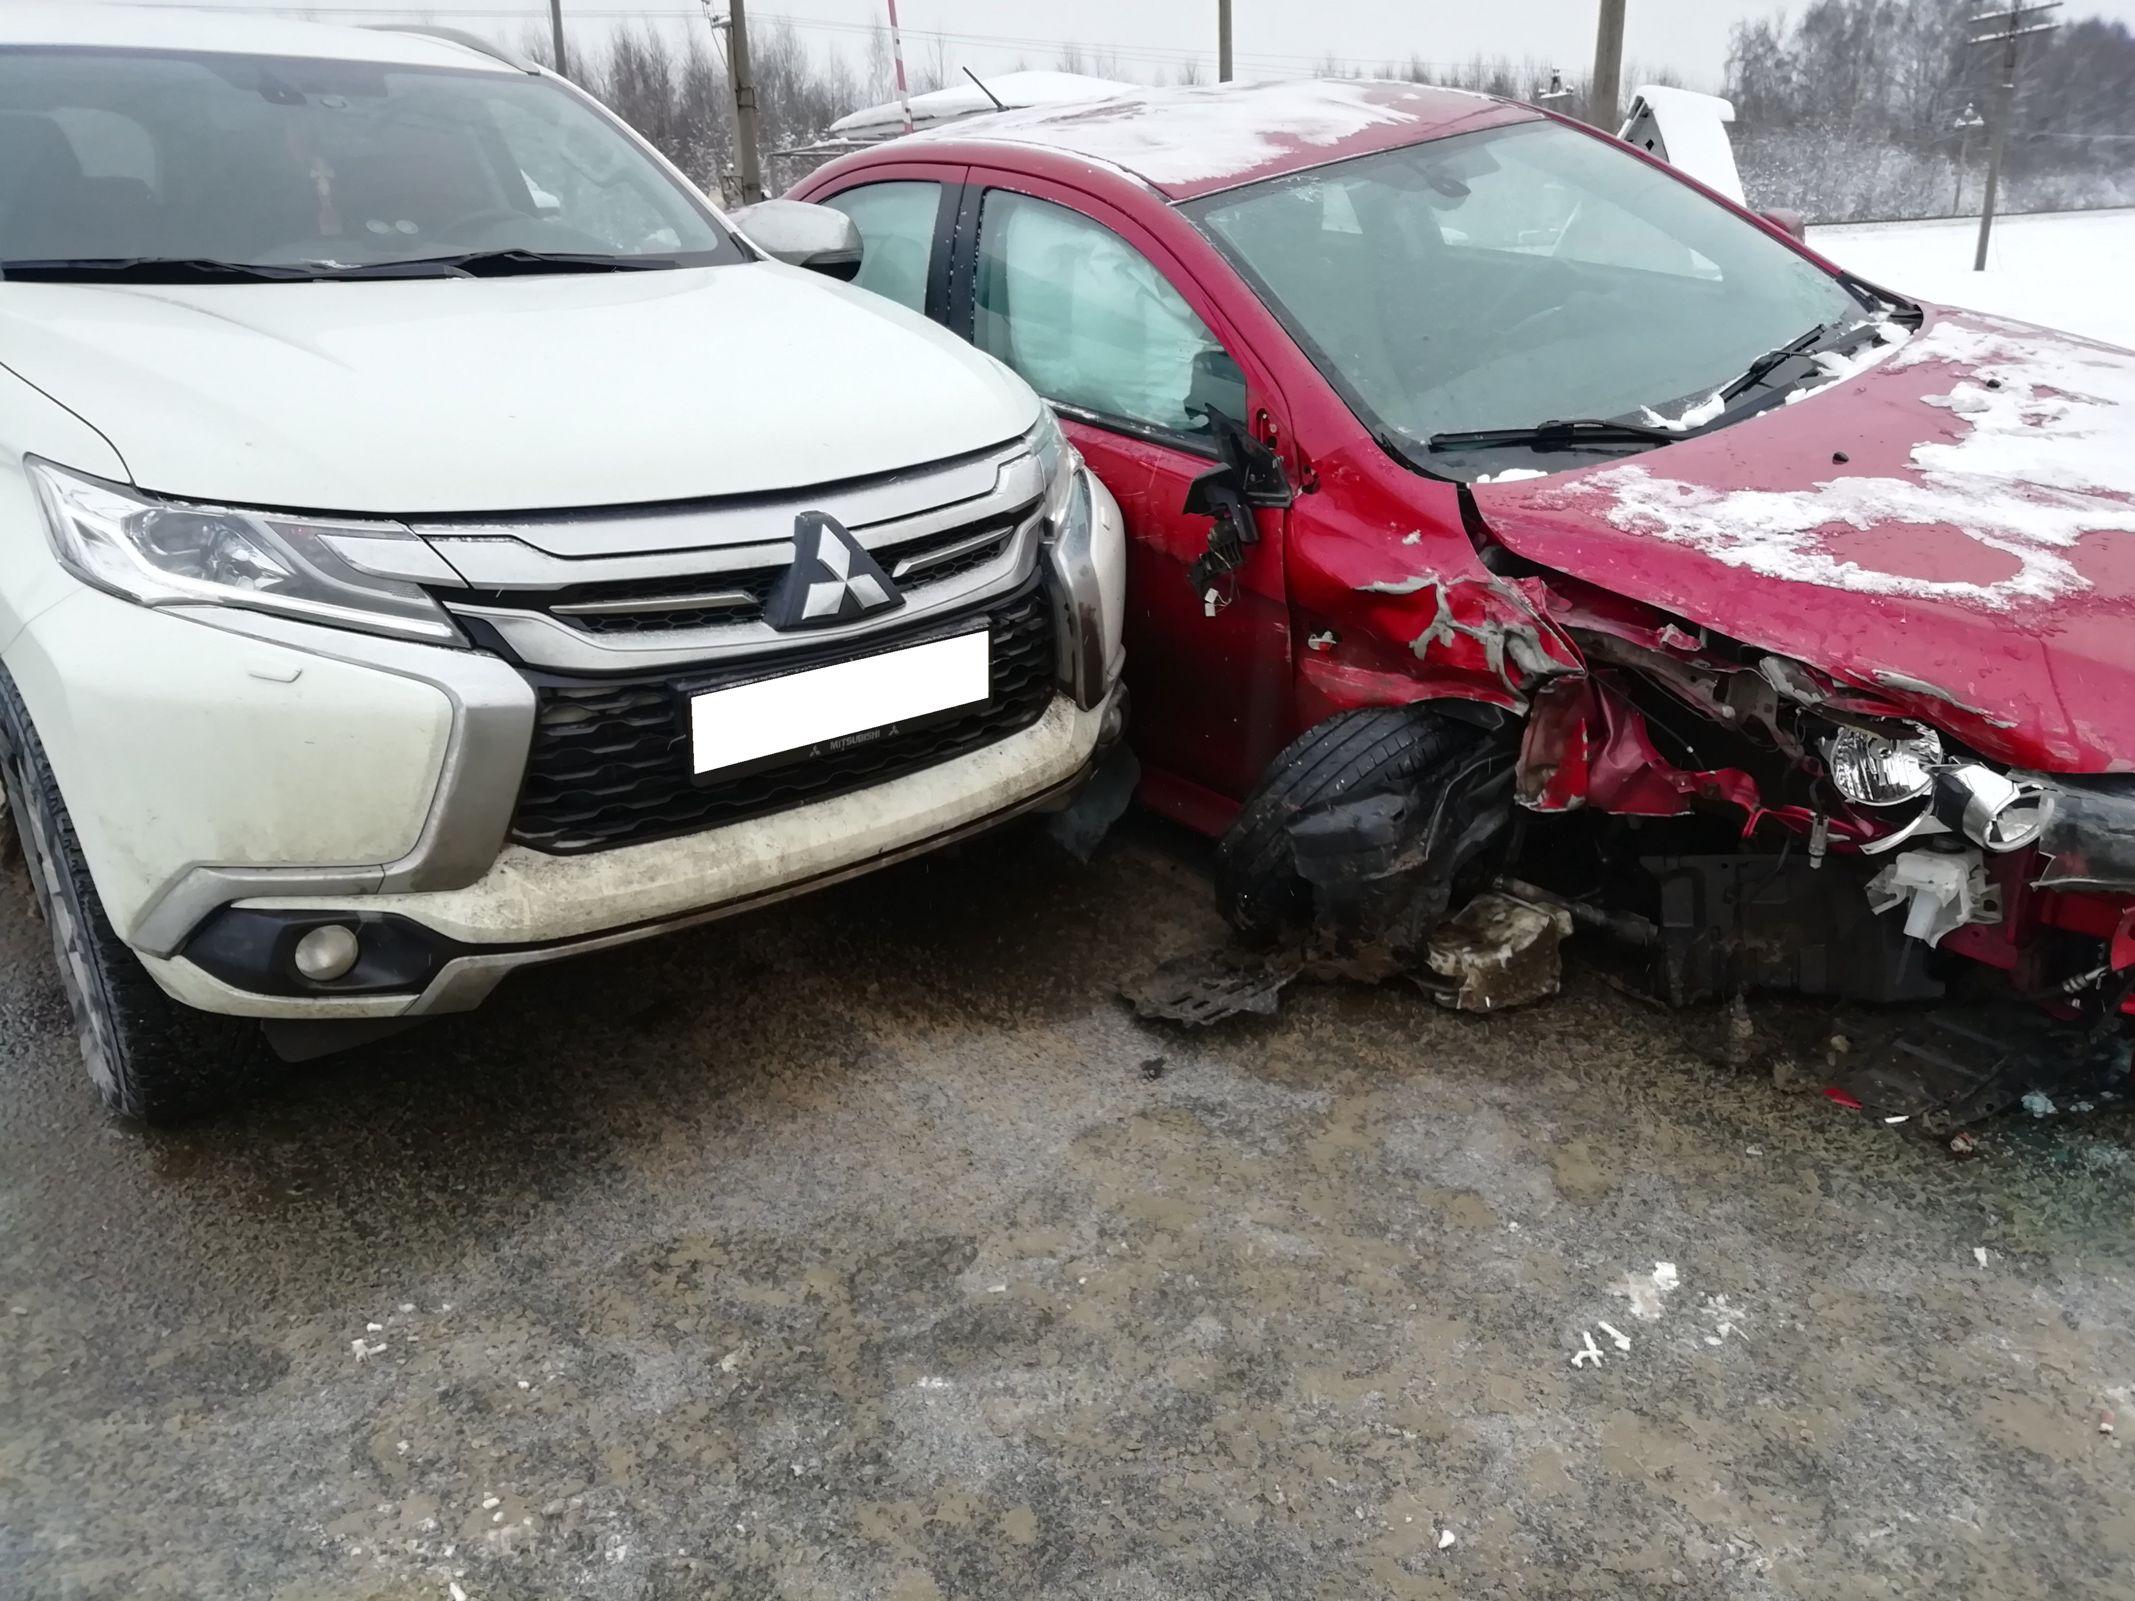 Две иномарки разбились на окружной в Рыбинске: пострадал мужчина